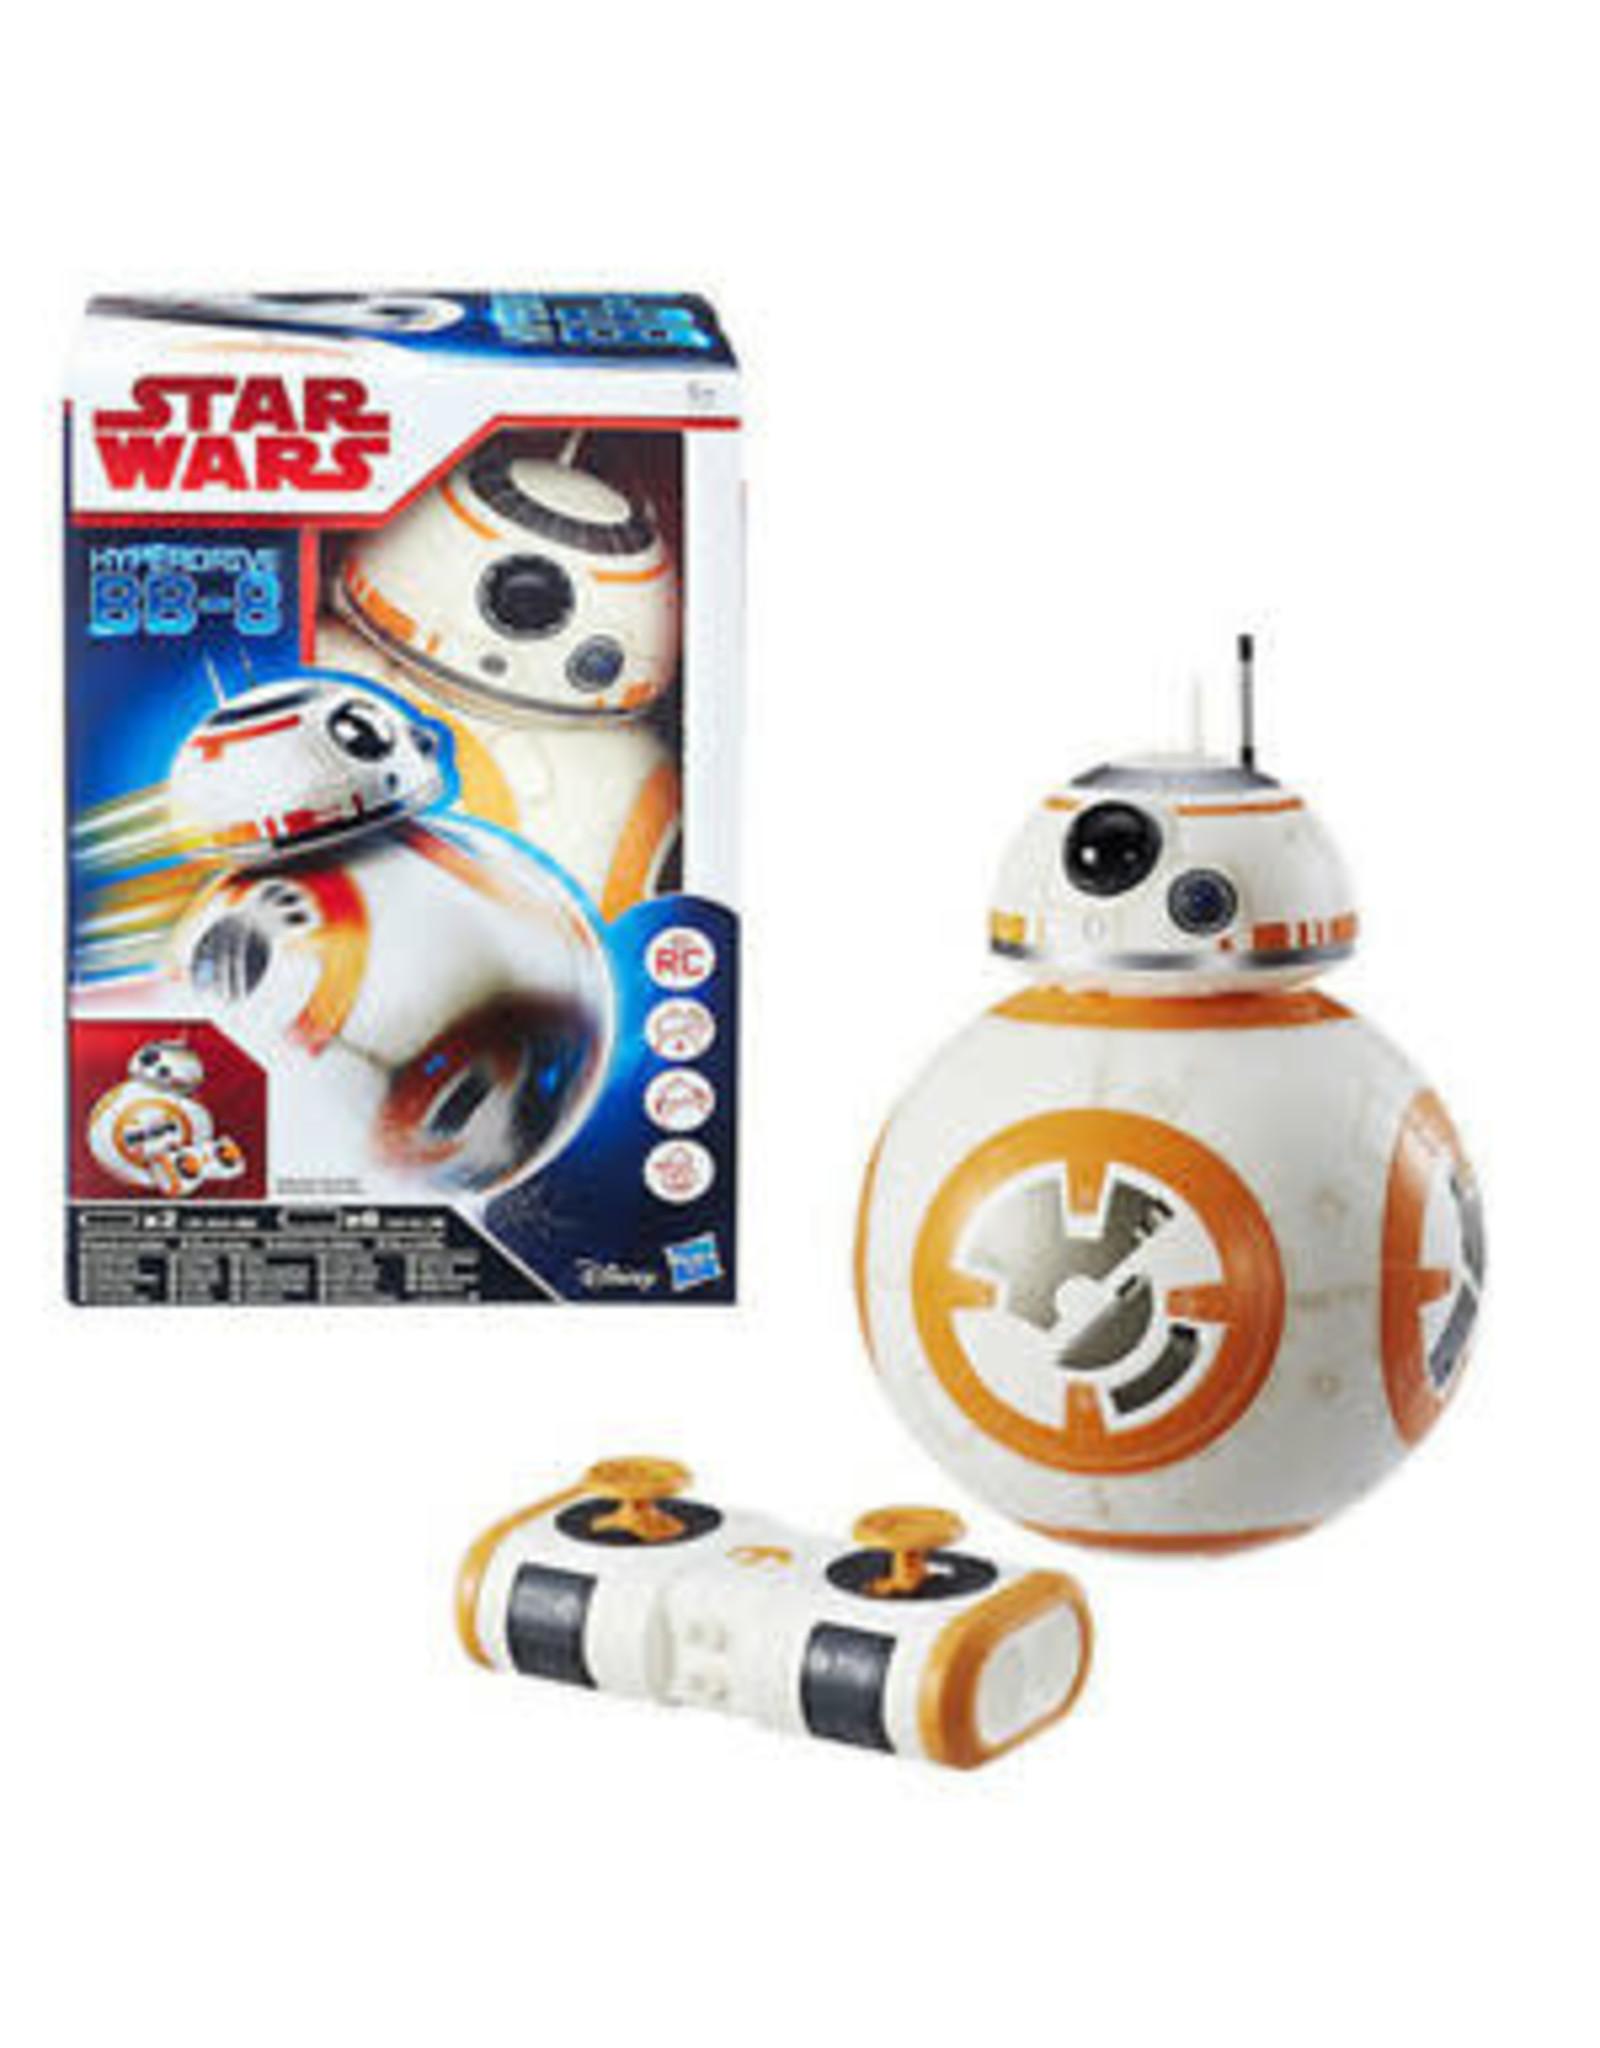 STAR WARS - Hyperdrive RC Droid BB-8